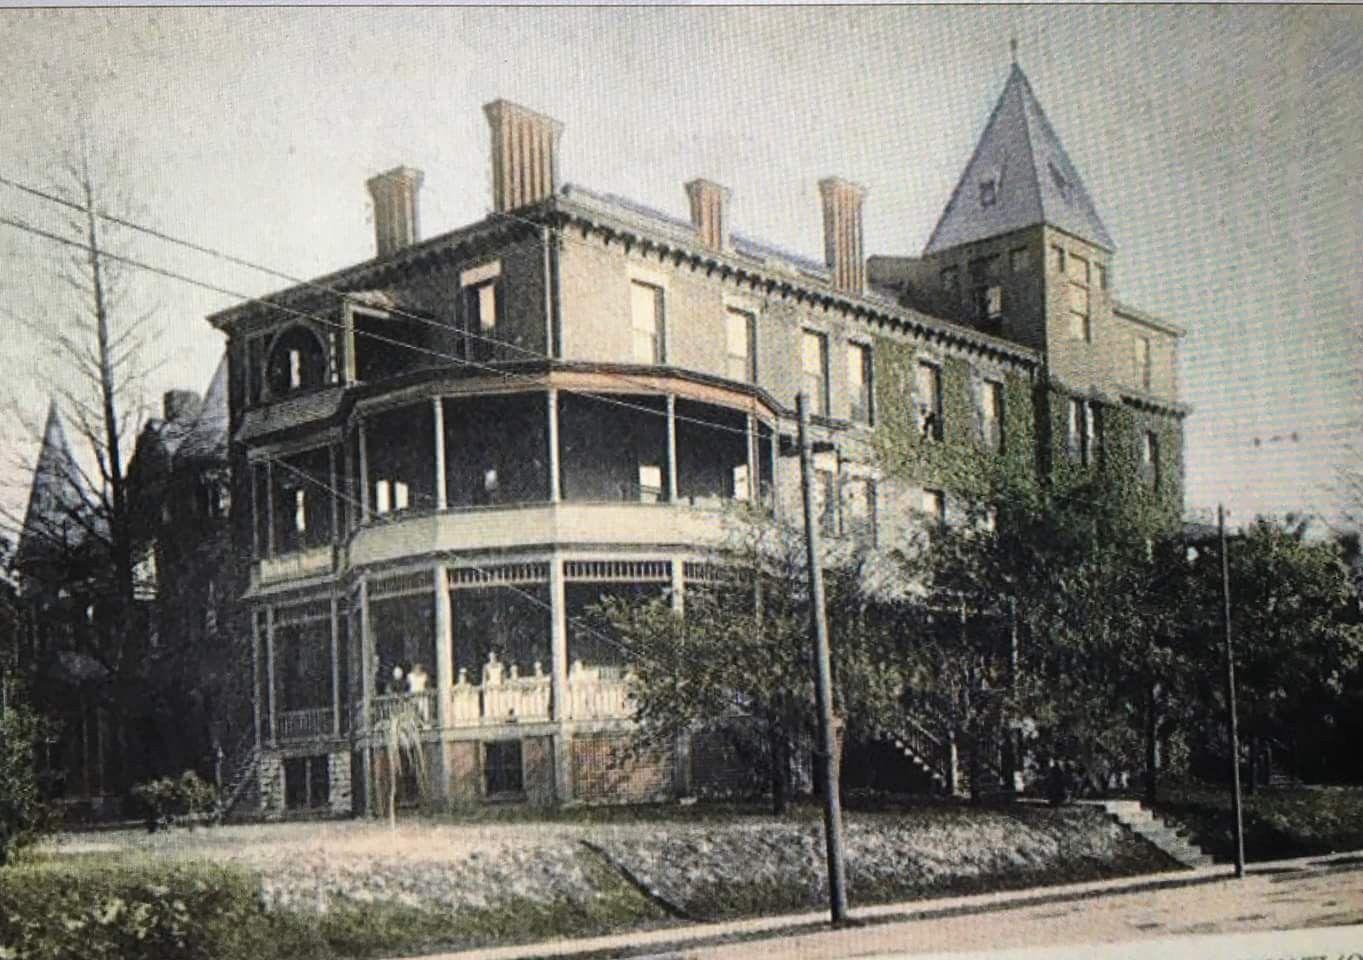 Bethesda oak hospital avondale late 1800s university